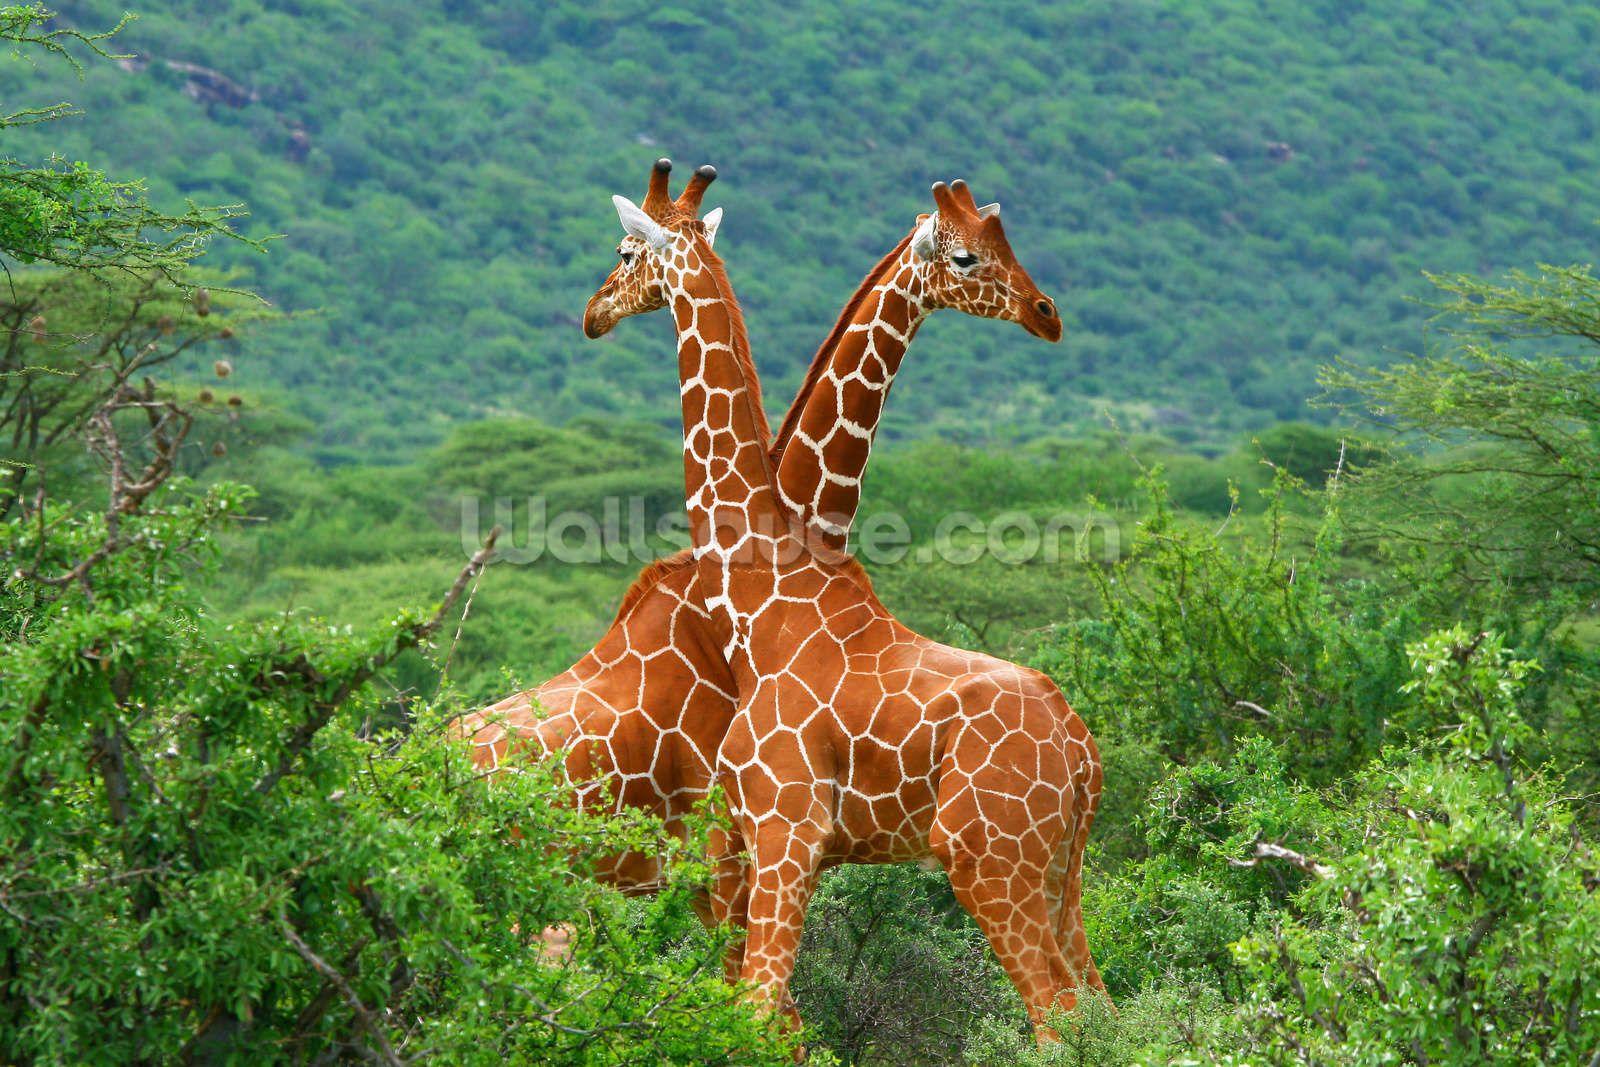 Giraffe Fight Wallpaper Wallsauce Us In 2021 Animals Wild Giraffe Pictures Nature Animals